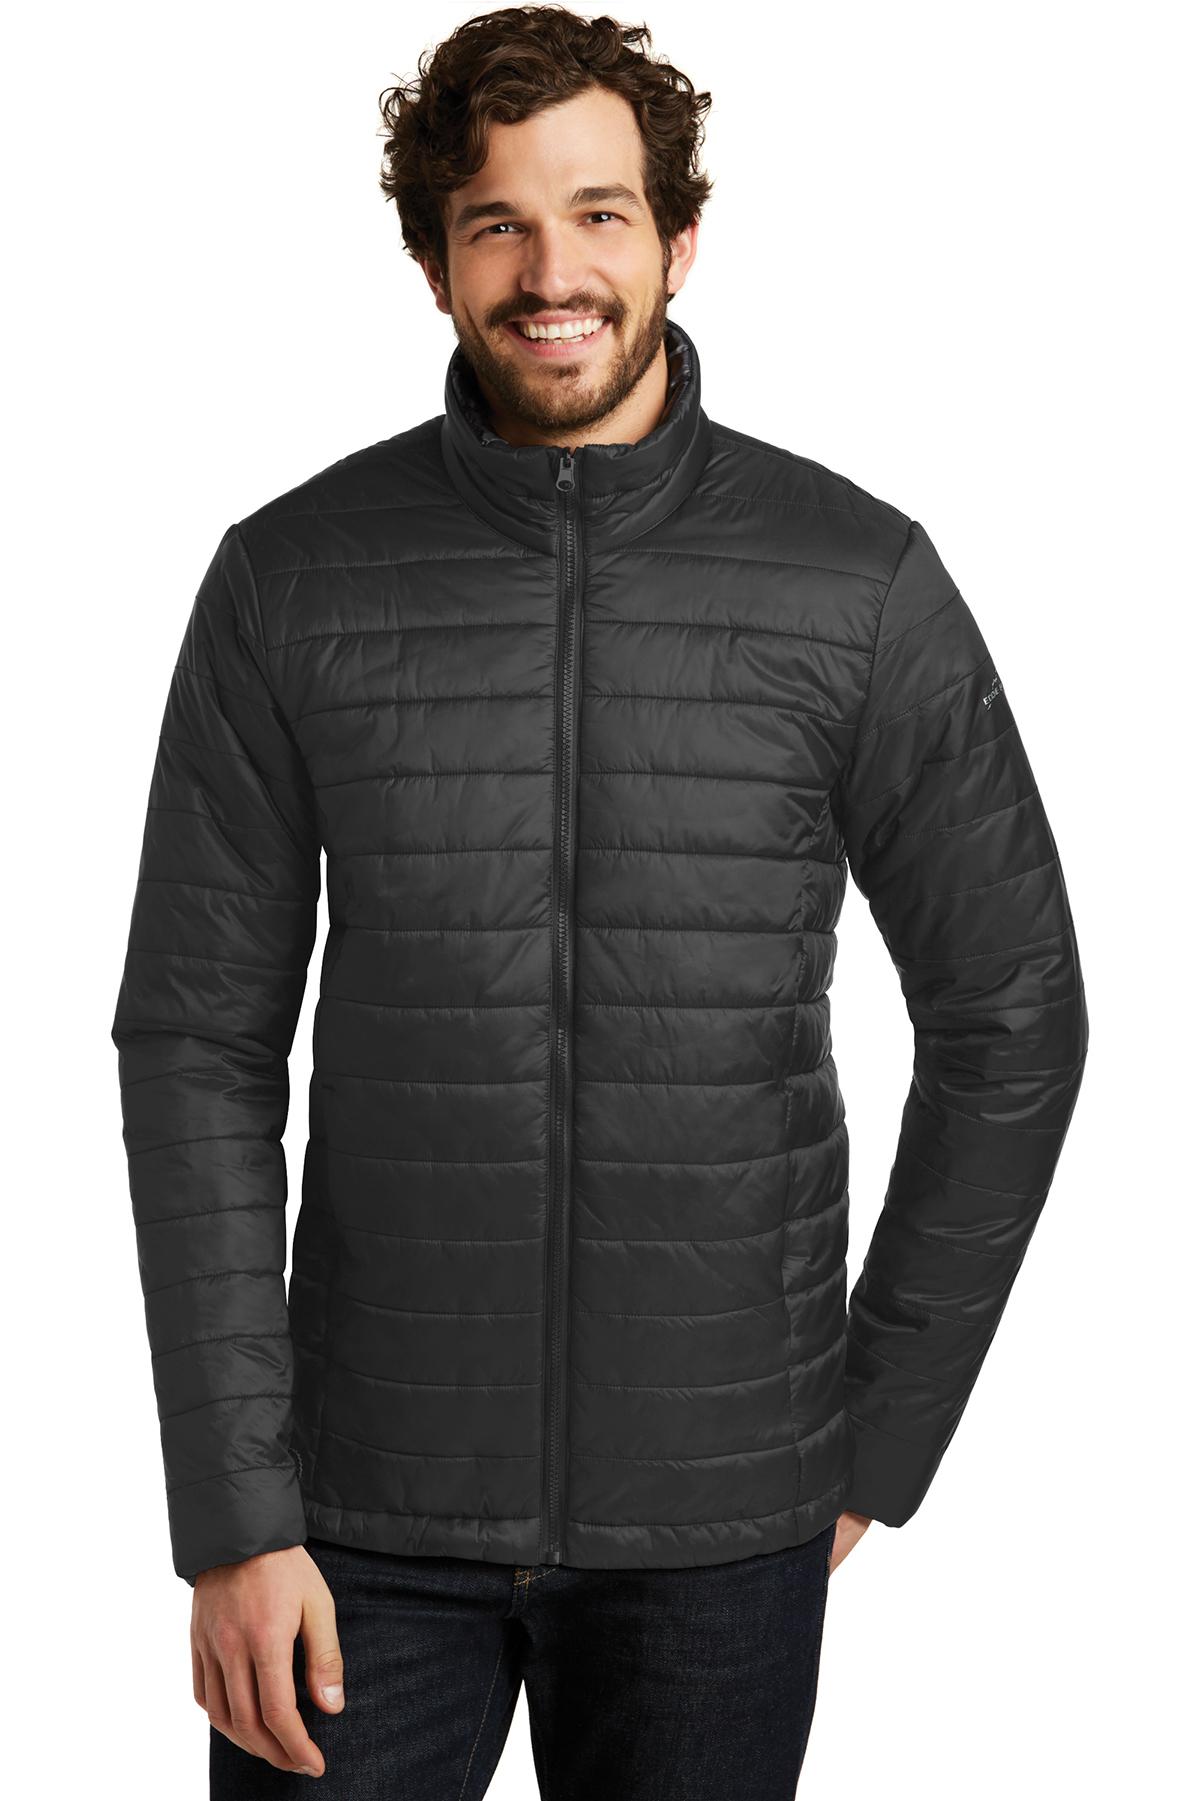 e163b279d45 Eddie Bauer® WeatherEdge® Plus 3-in-1 Jacket | 3-in-1 | Outerwear ...